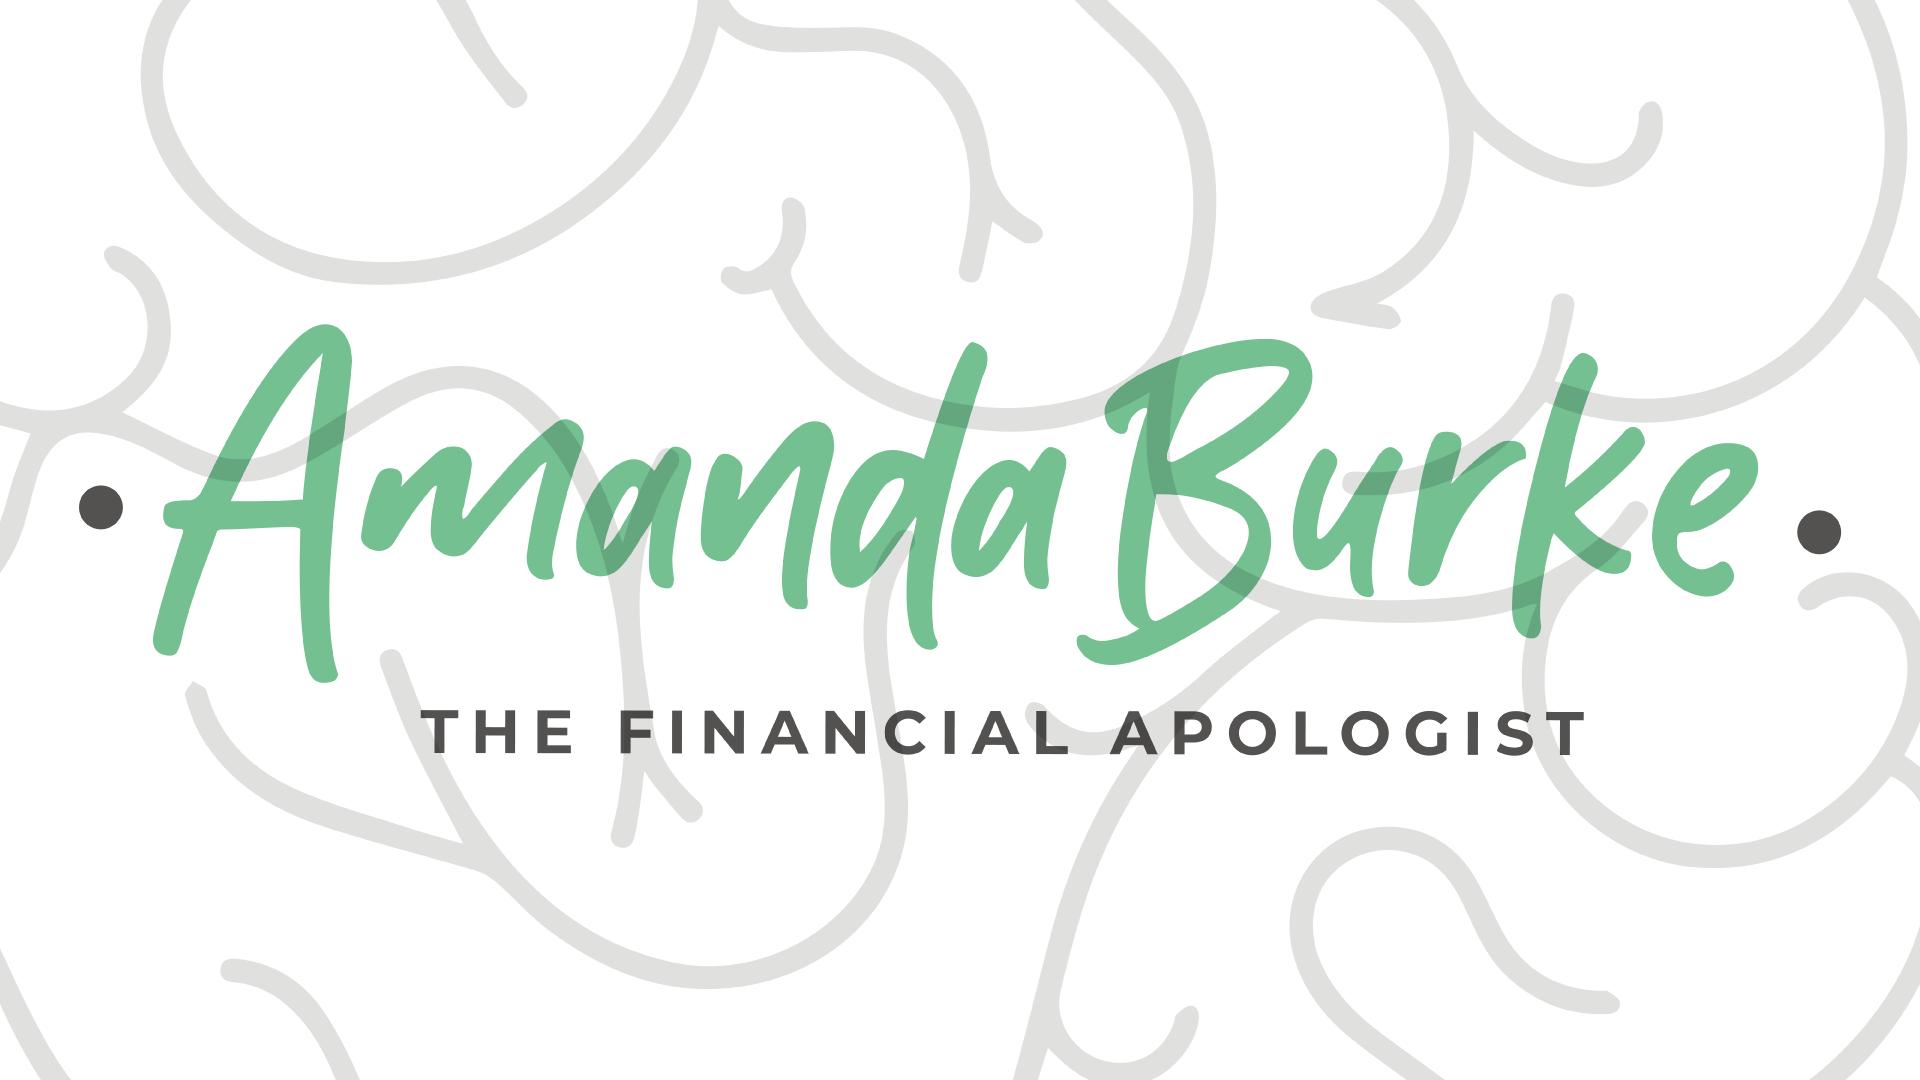 Title: Amanda Burke the Financial Apologist